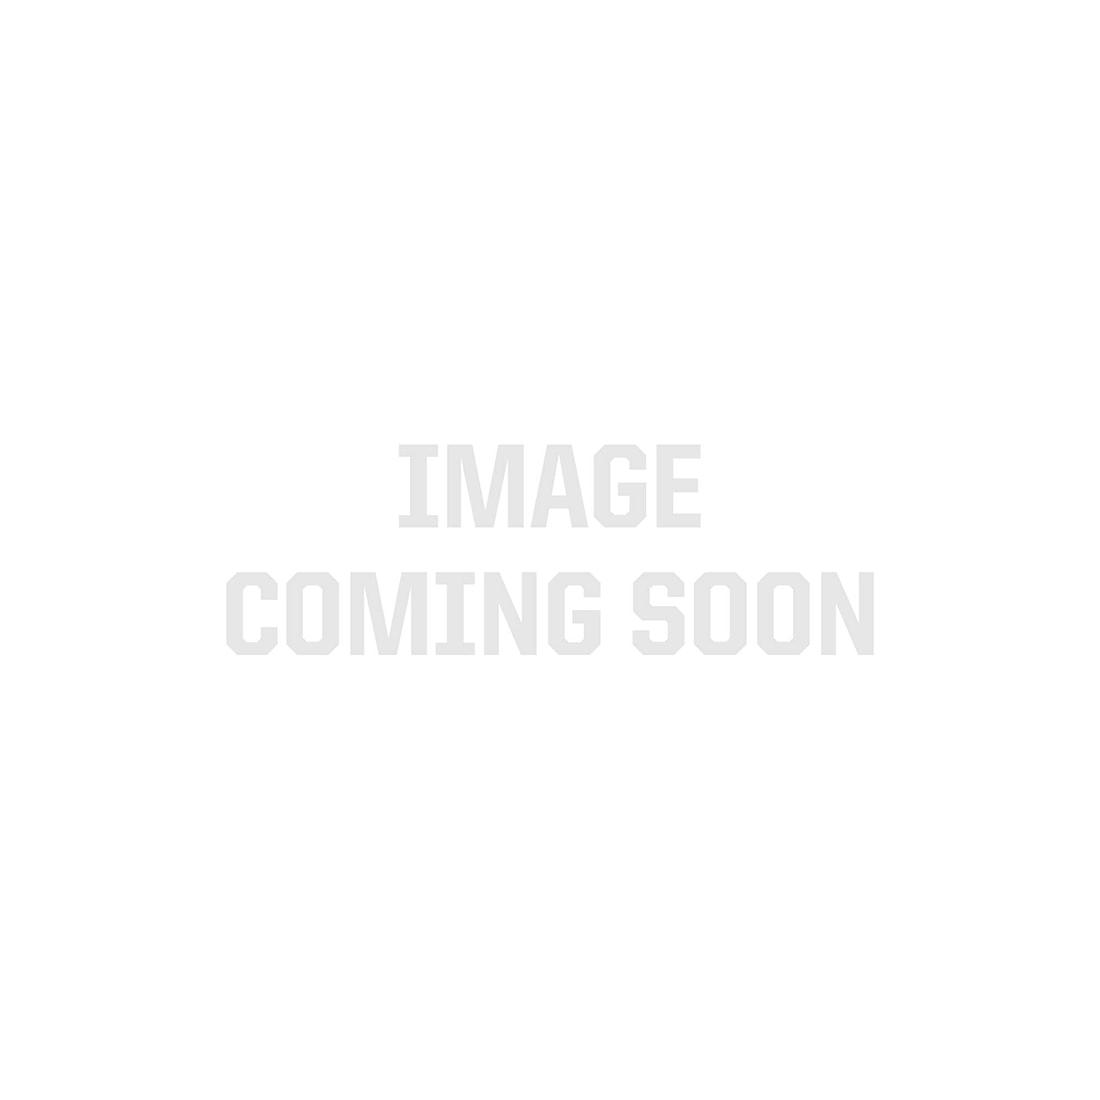 Waterproof RGA 5050 Single Row CurrentControl LED Strip Light, 60/m, 12mm wide, Sample Kit